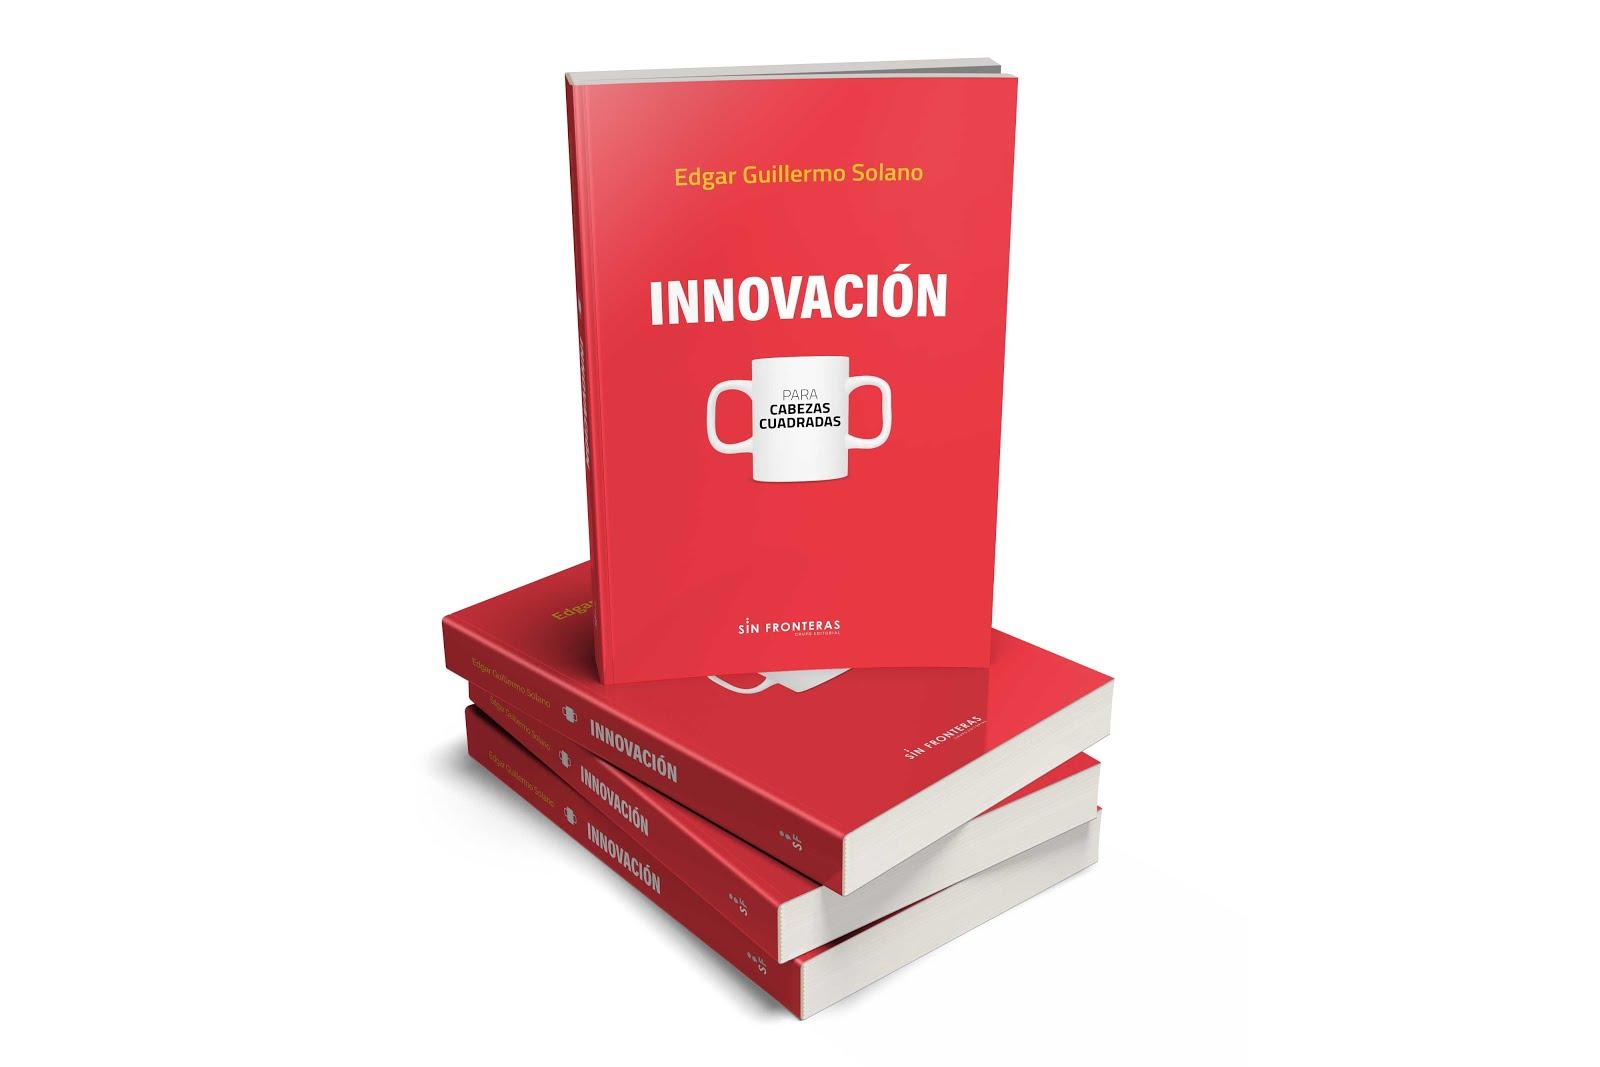 Innovación para Cabezas cuadradas